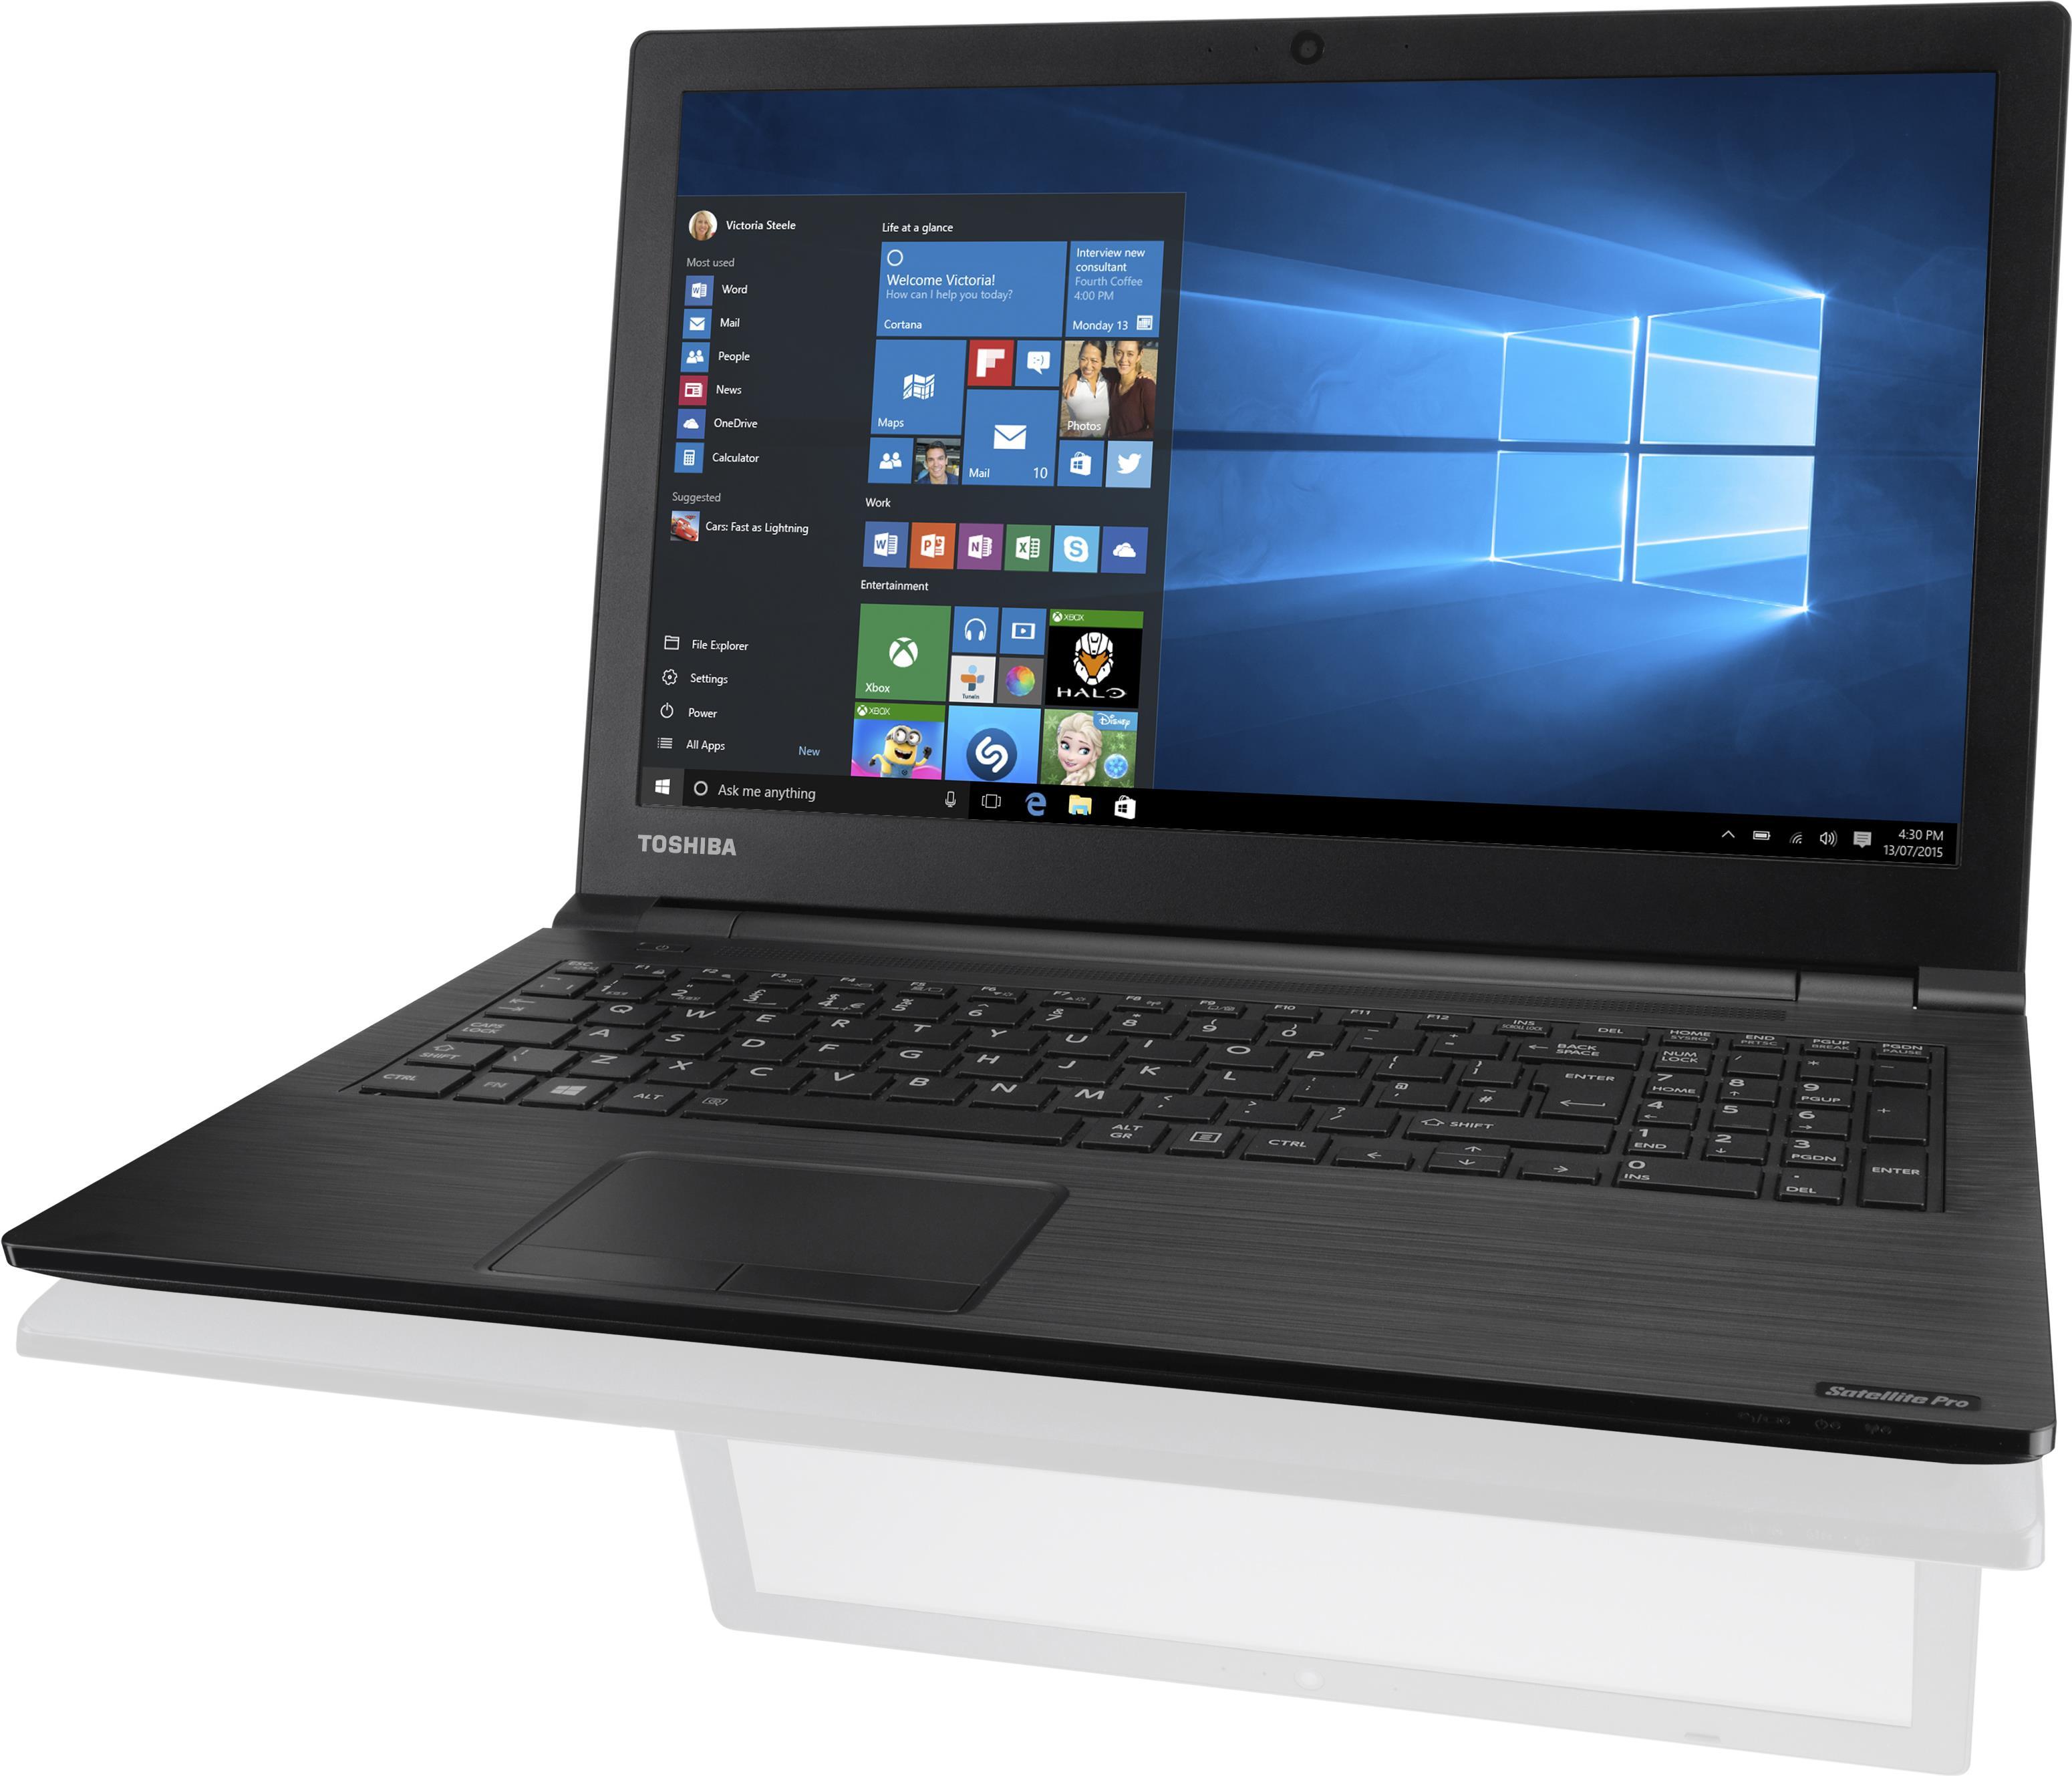 Notebooks, Laptops - Toshiba Satellite Pro R50 C 185 Core i3 6006U 2.2 GHz Win 10 Pro 64 Bit 4 GB RAM 128 GB SSD DVD SuperMulti 39.6 cm (15.6) 1366 x 768 (HD) HD Graphics 520 Wi Fi Schwarz  - Onlineshop JACOB Elektronik